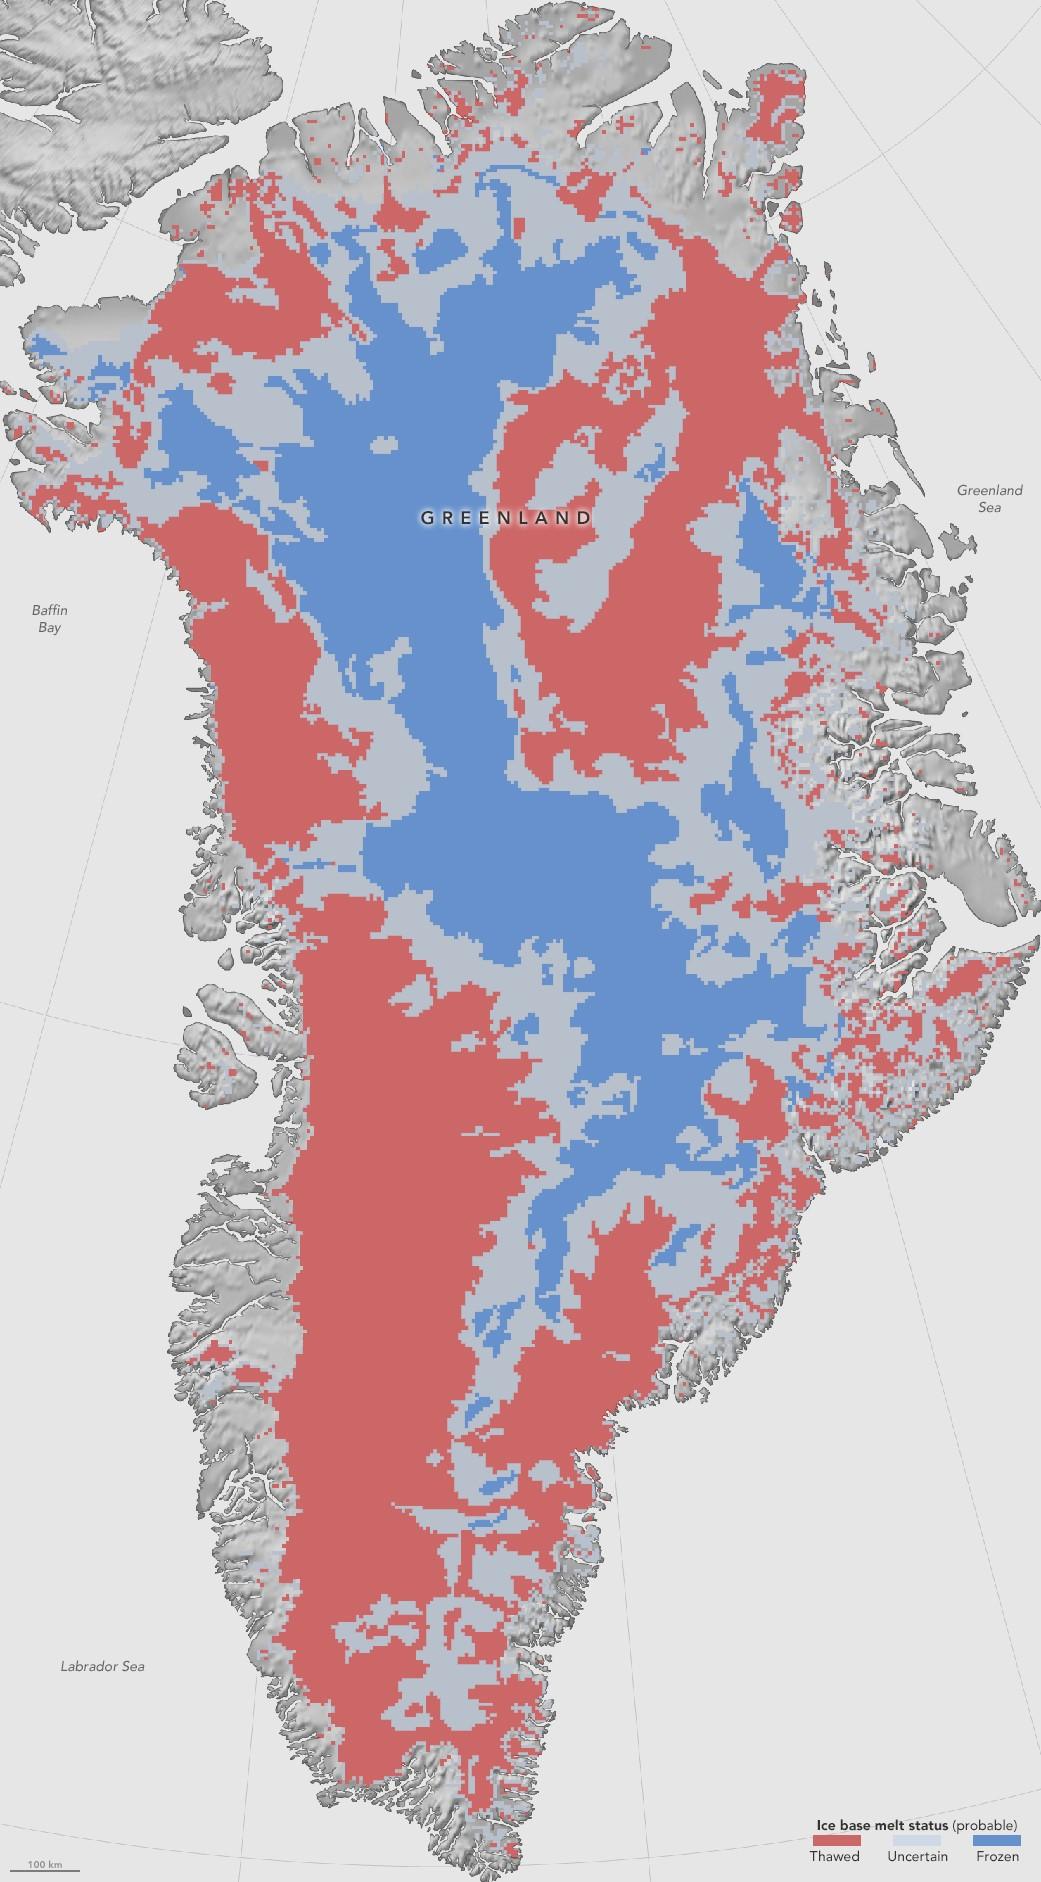 Nasa maps thawed areas under greenland ice sheet gumiabroncs Gallery